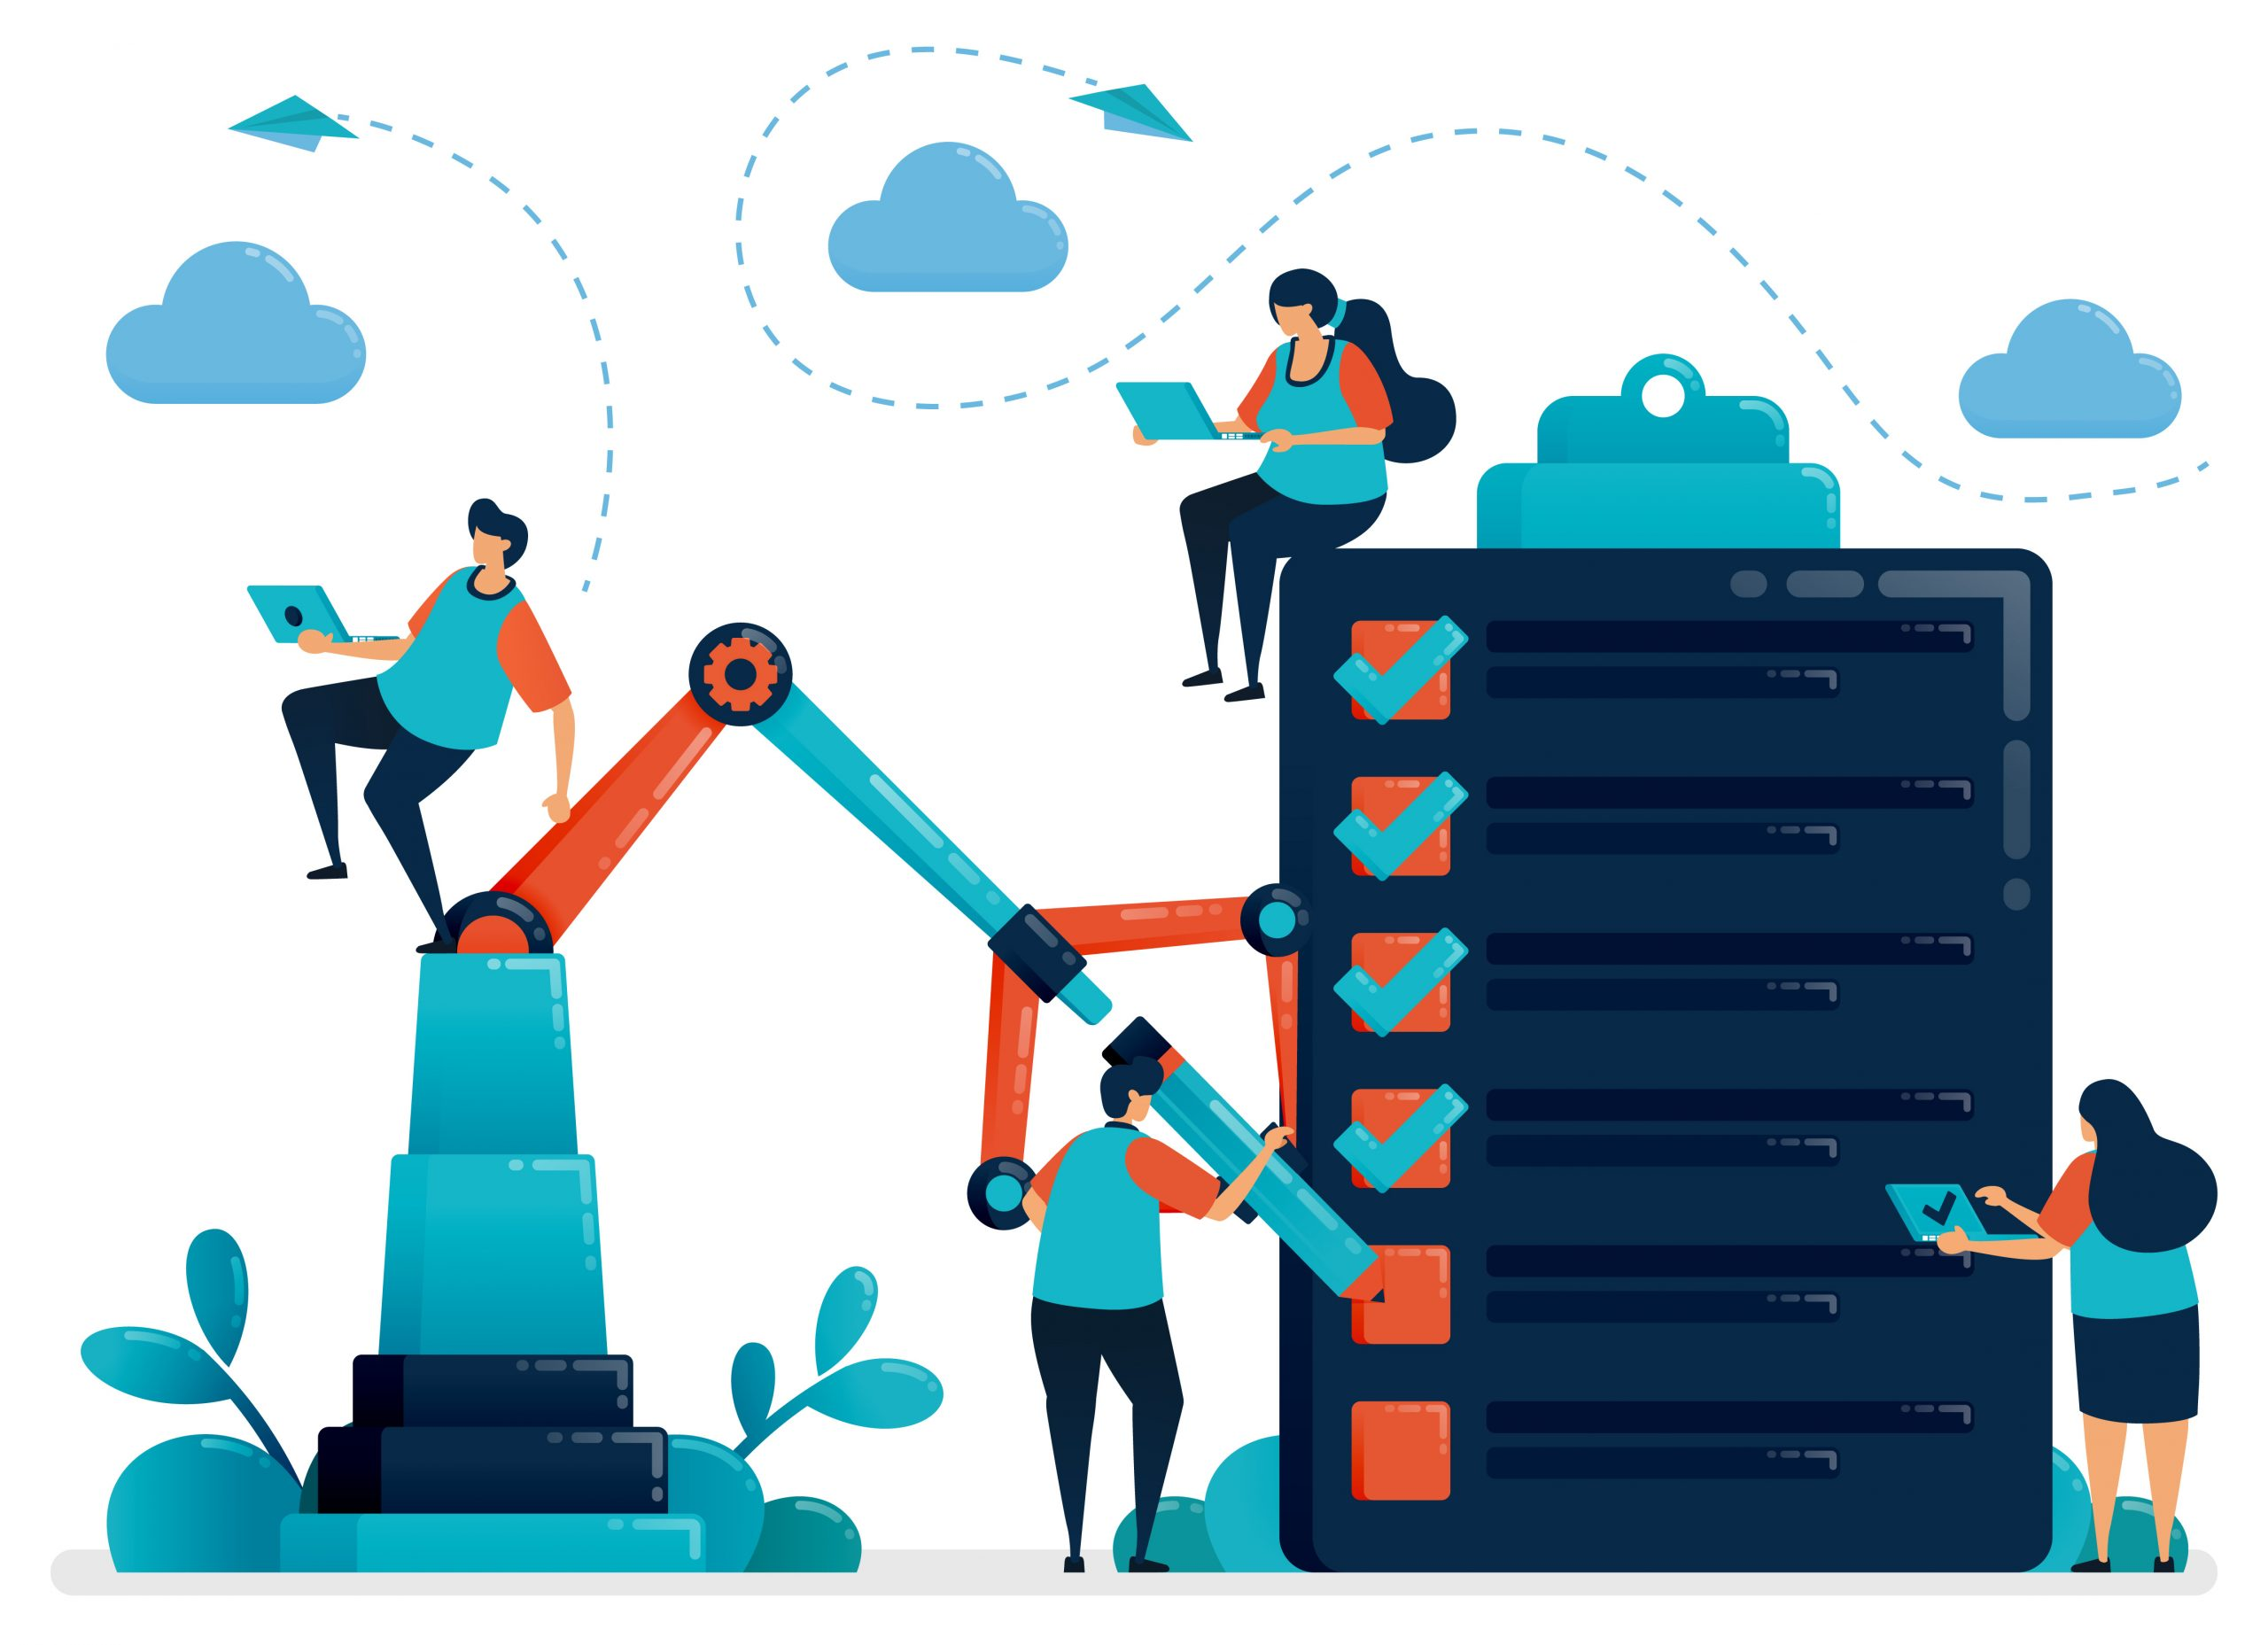 Iot: Aprovecha Hoy Las Ventajas del Mañana